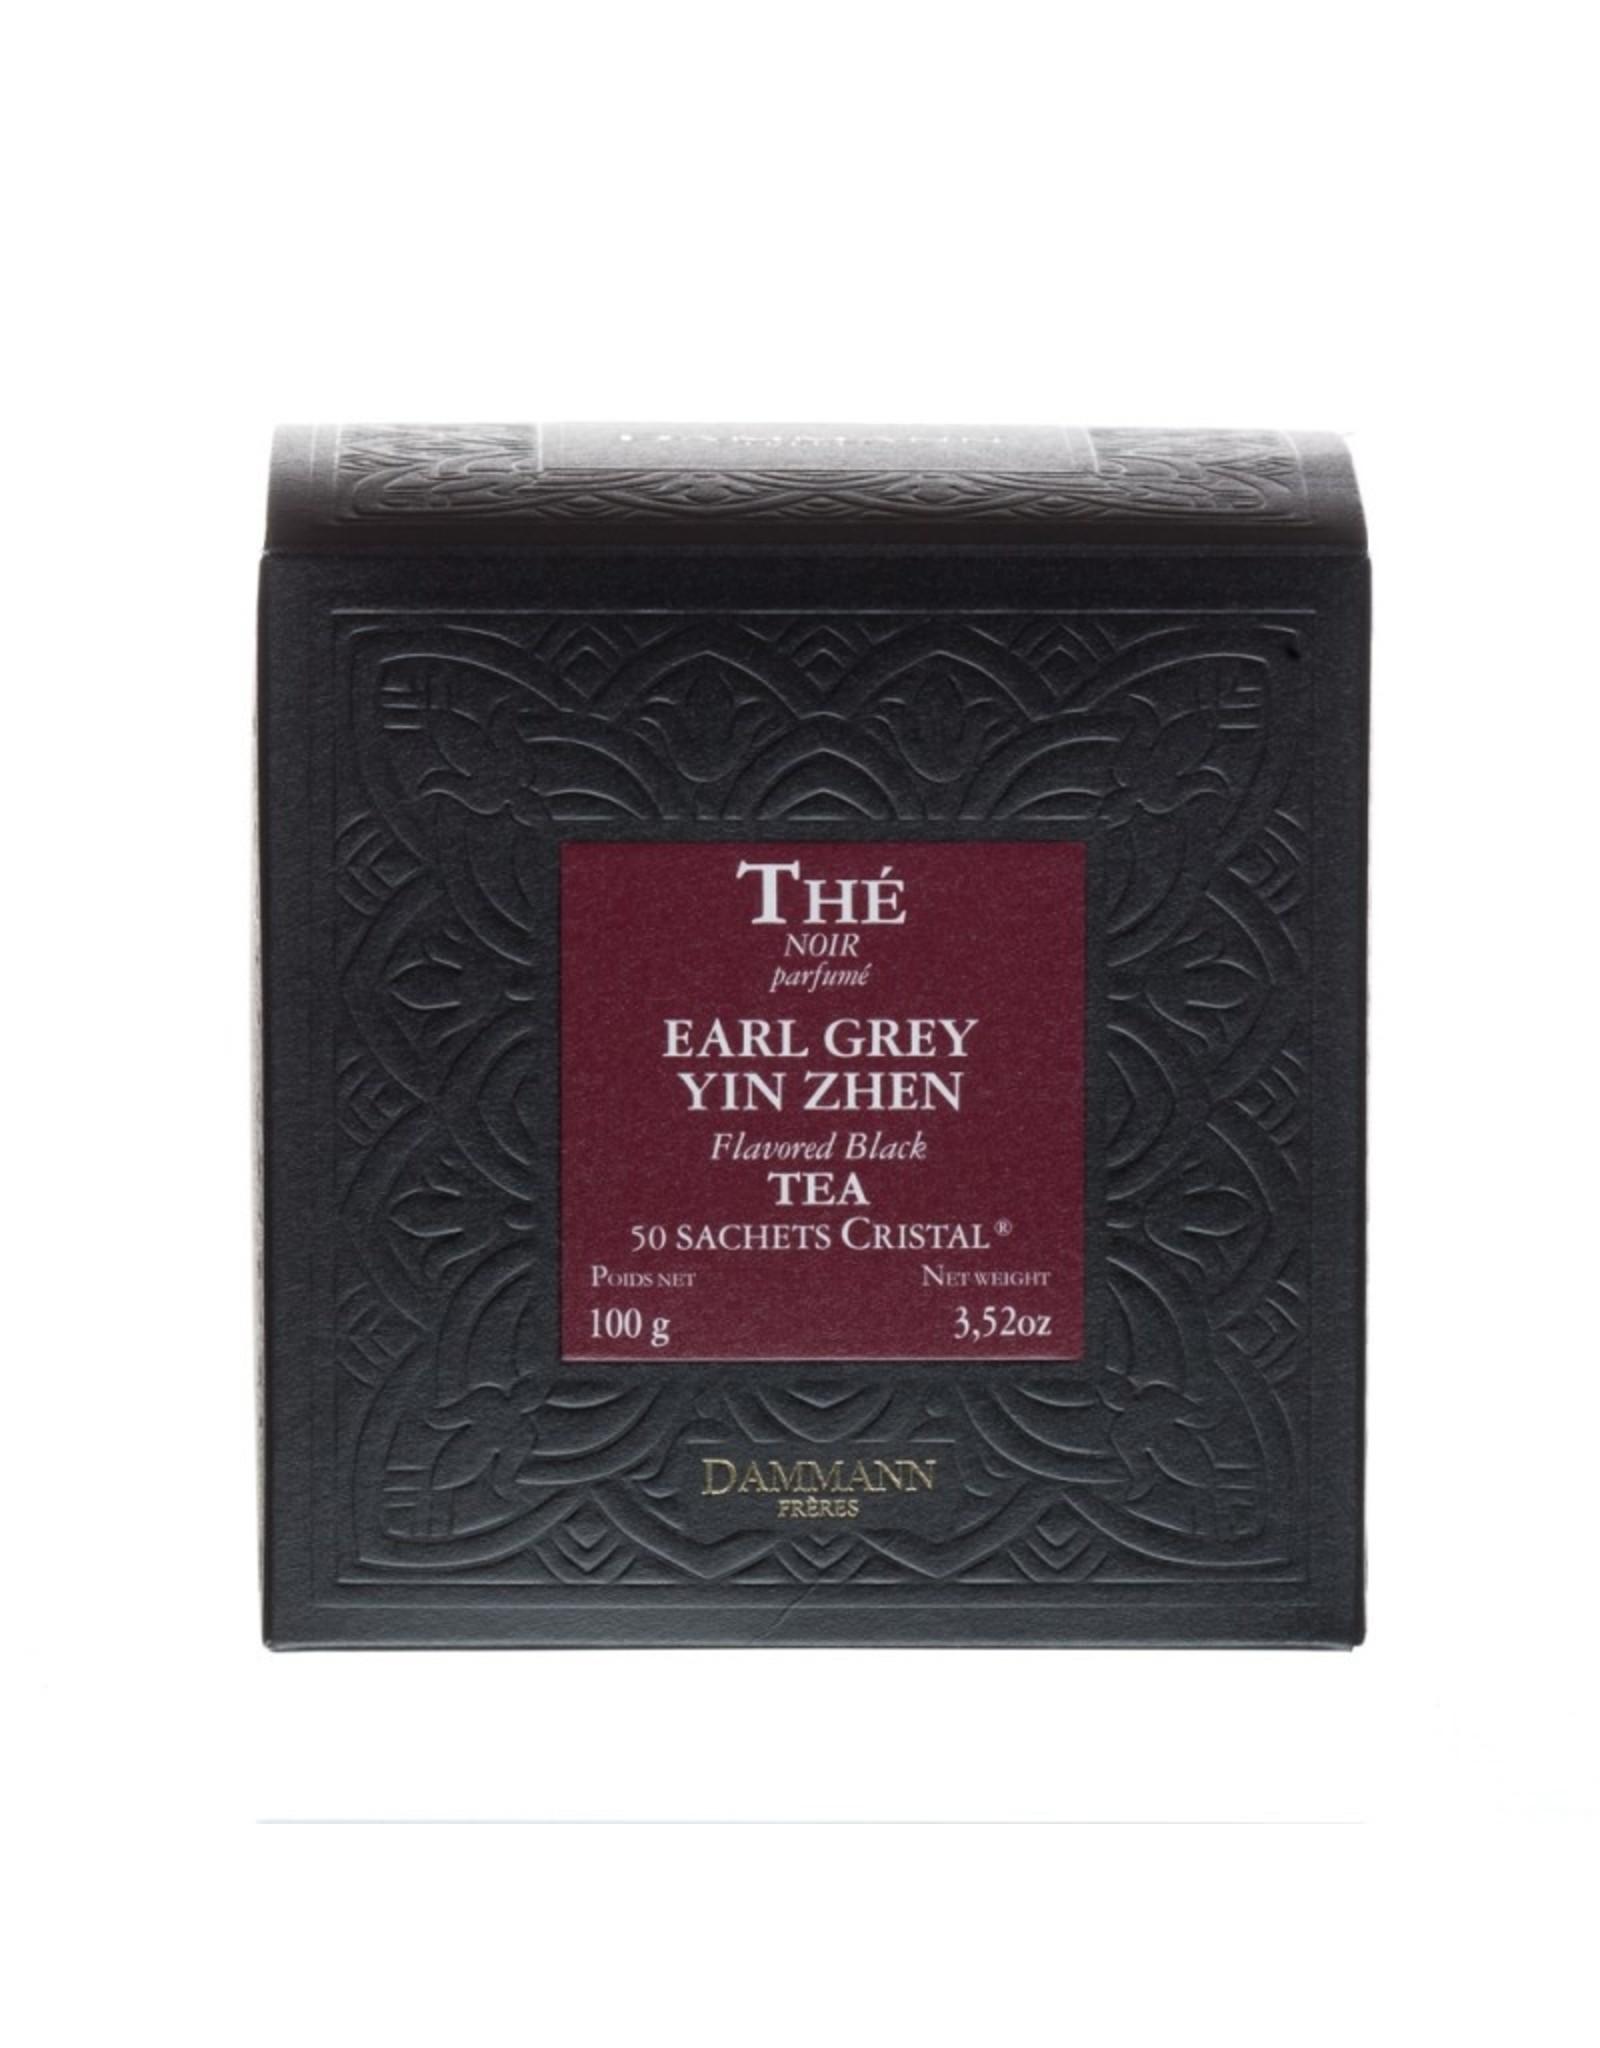 Dammann 'Earl Grey Yin Zhen' Flavoured Black tea